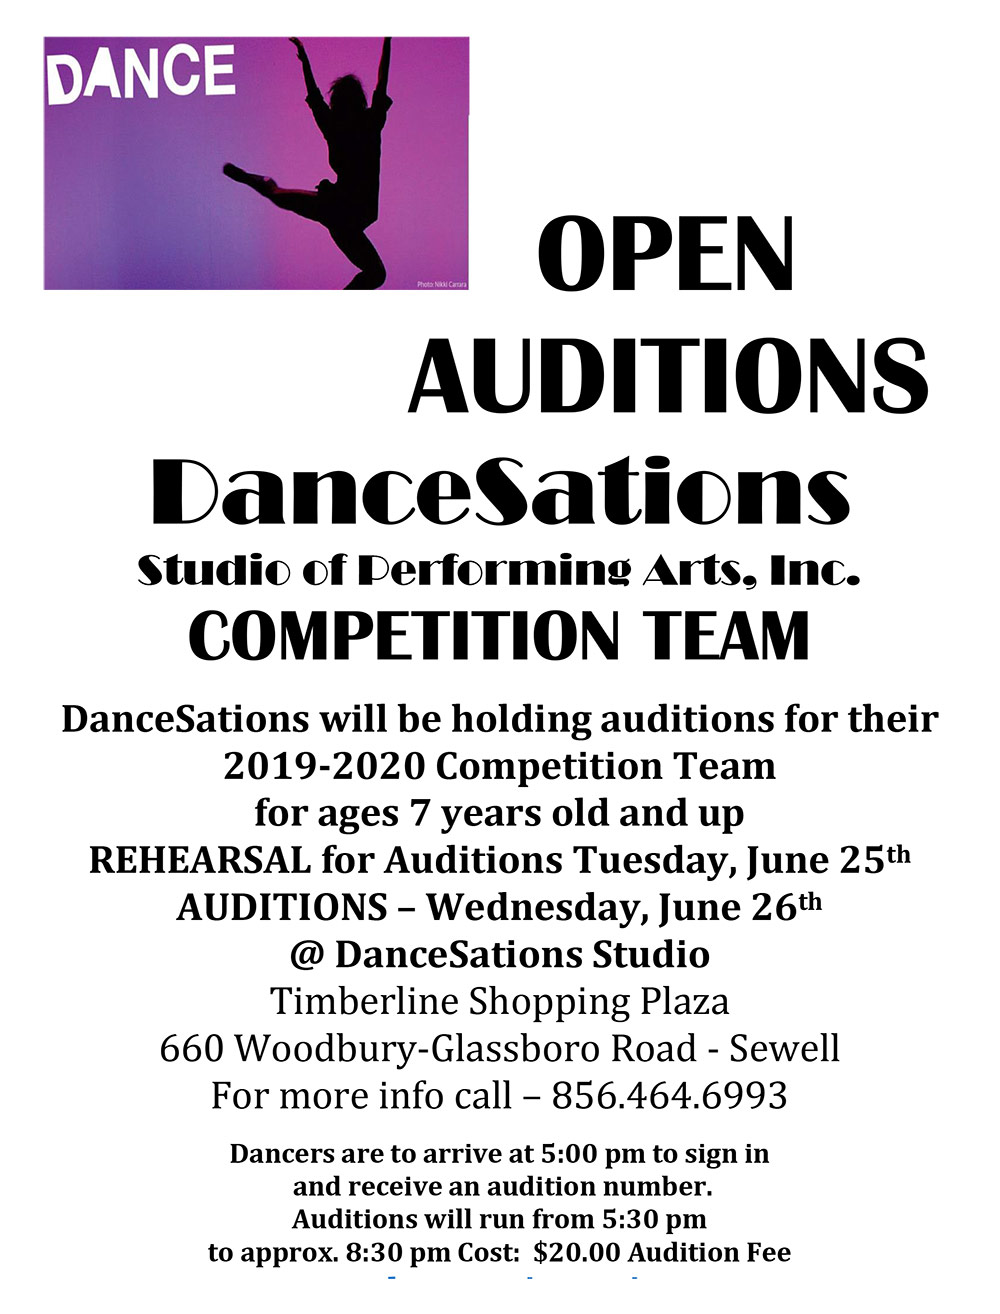 Dancesations Competition Team Audition 2019